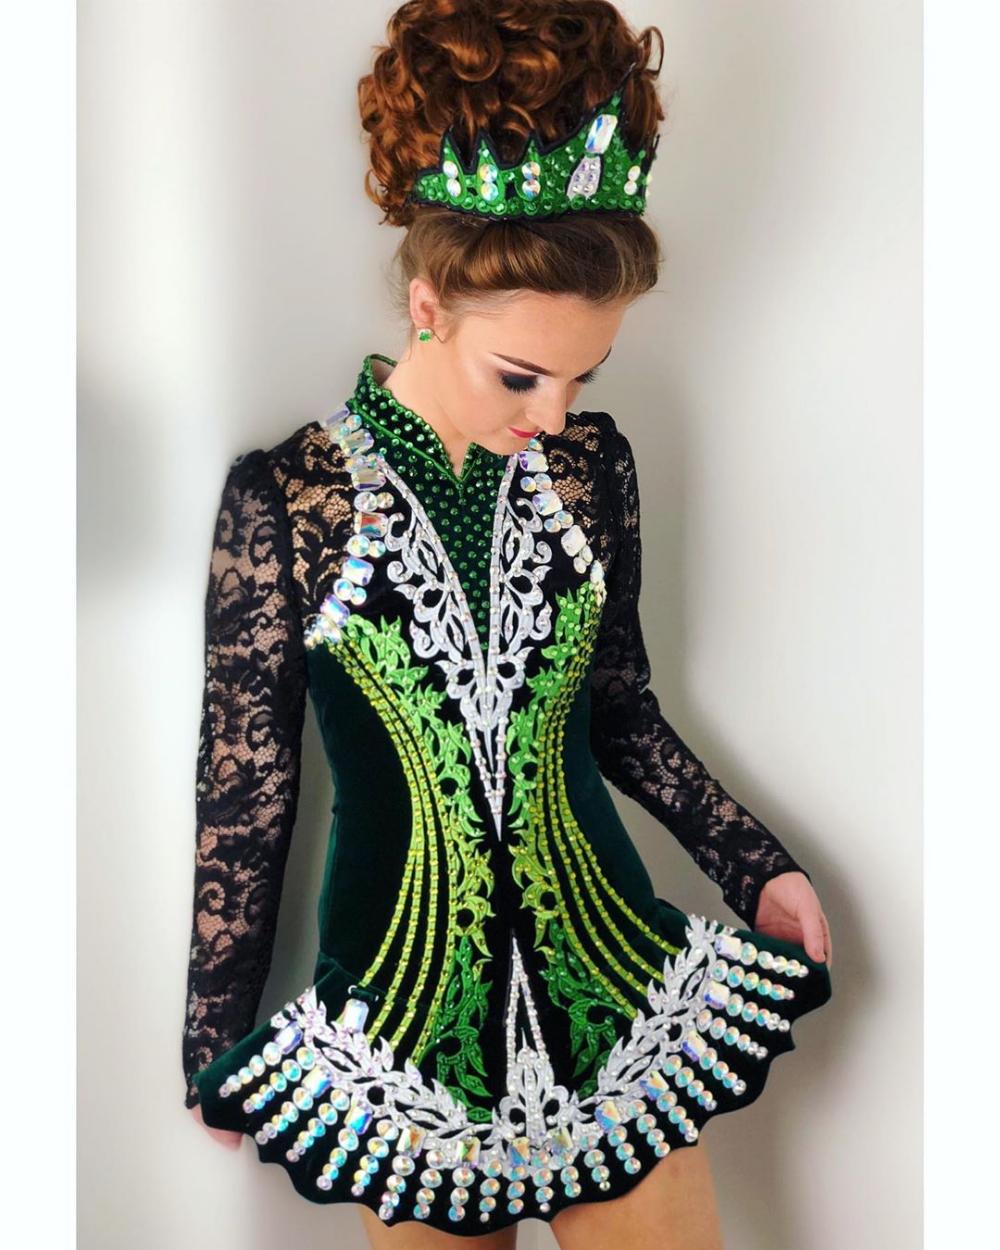 Emma Elitedancedesigns 2019 Embroidery Crystals Costume Irishdance Ir Irish Dance Dress Designs Irish Dance Solo Dress Irish Dance Costume